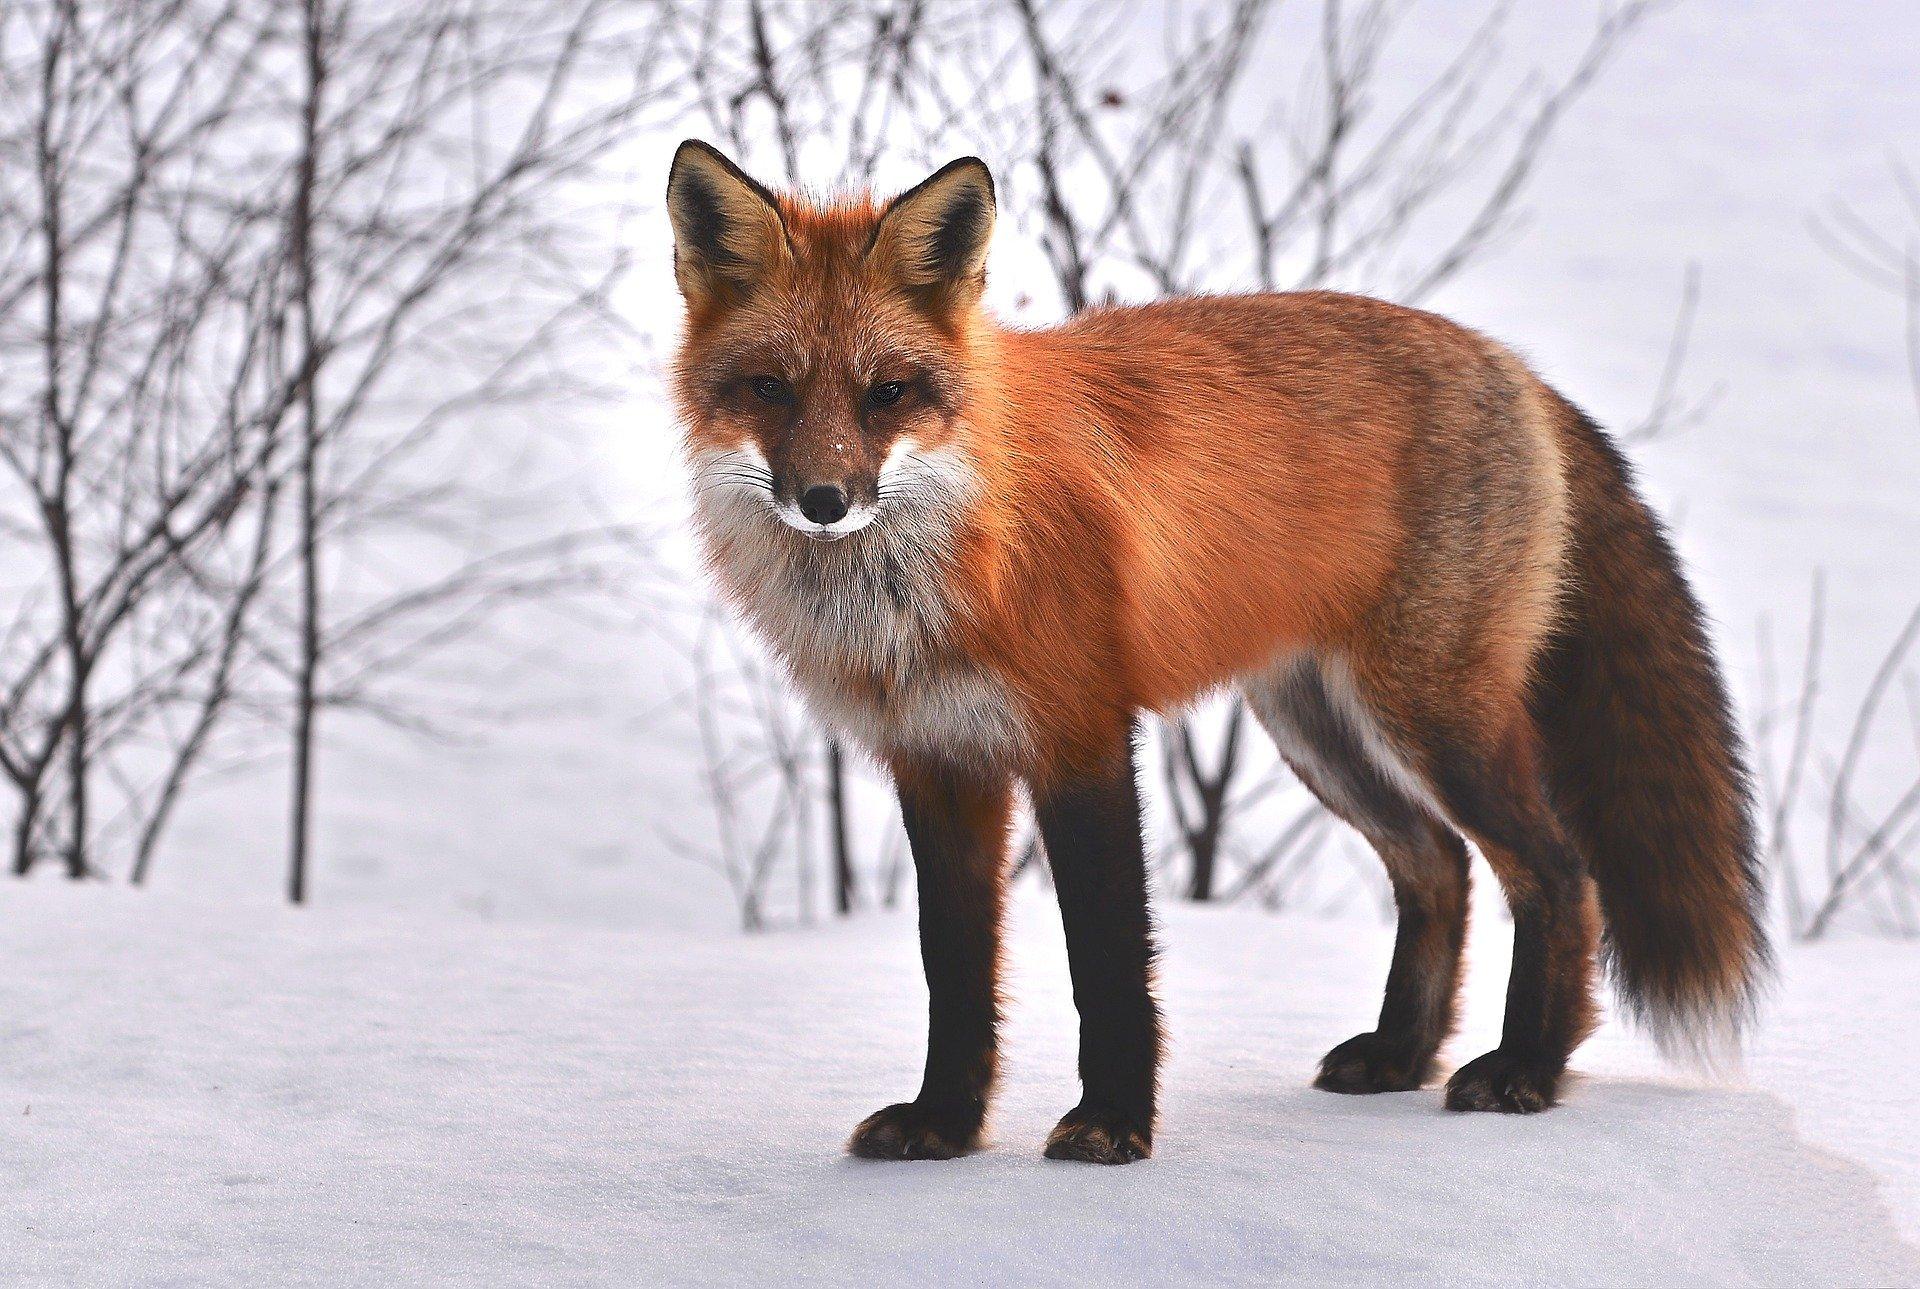 Rotfuchs - red fox